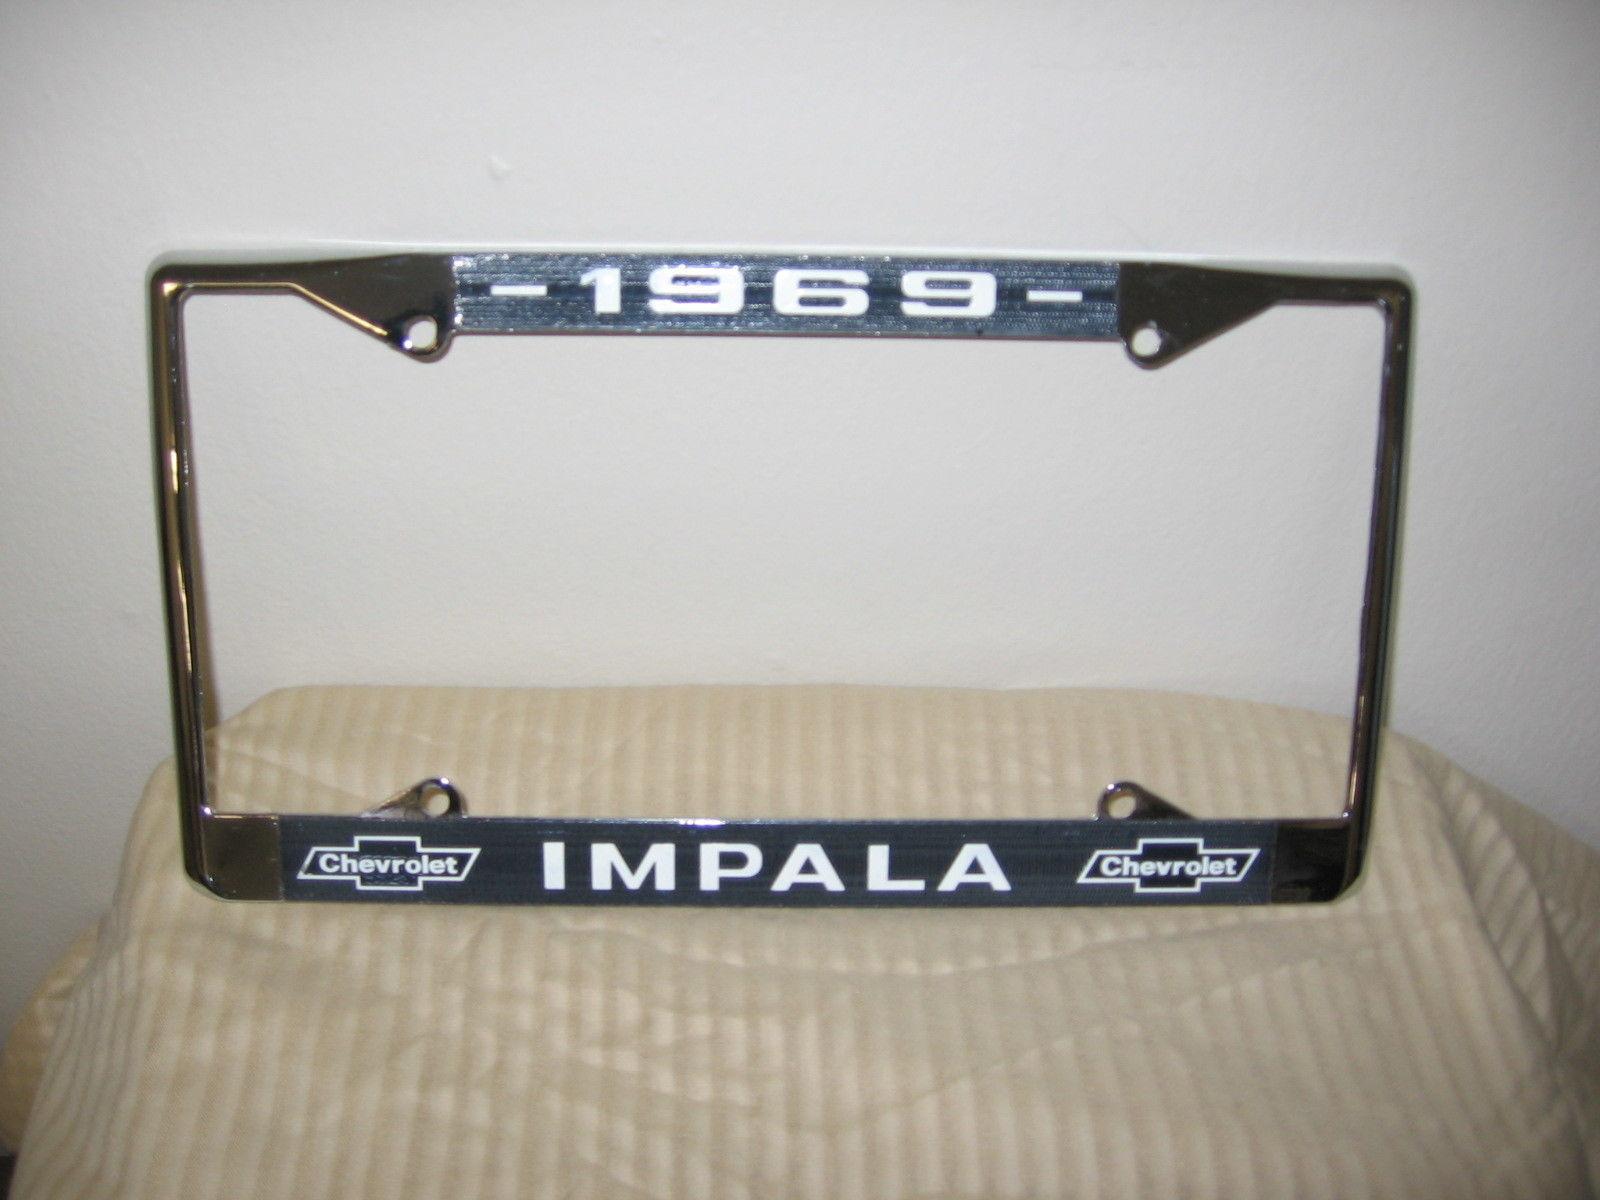 Chevy License Plate Frame: 13 listings